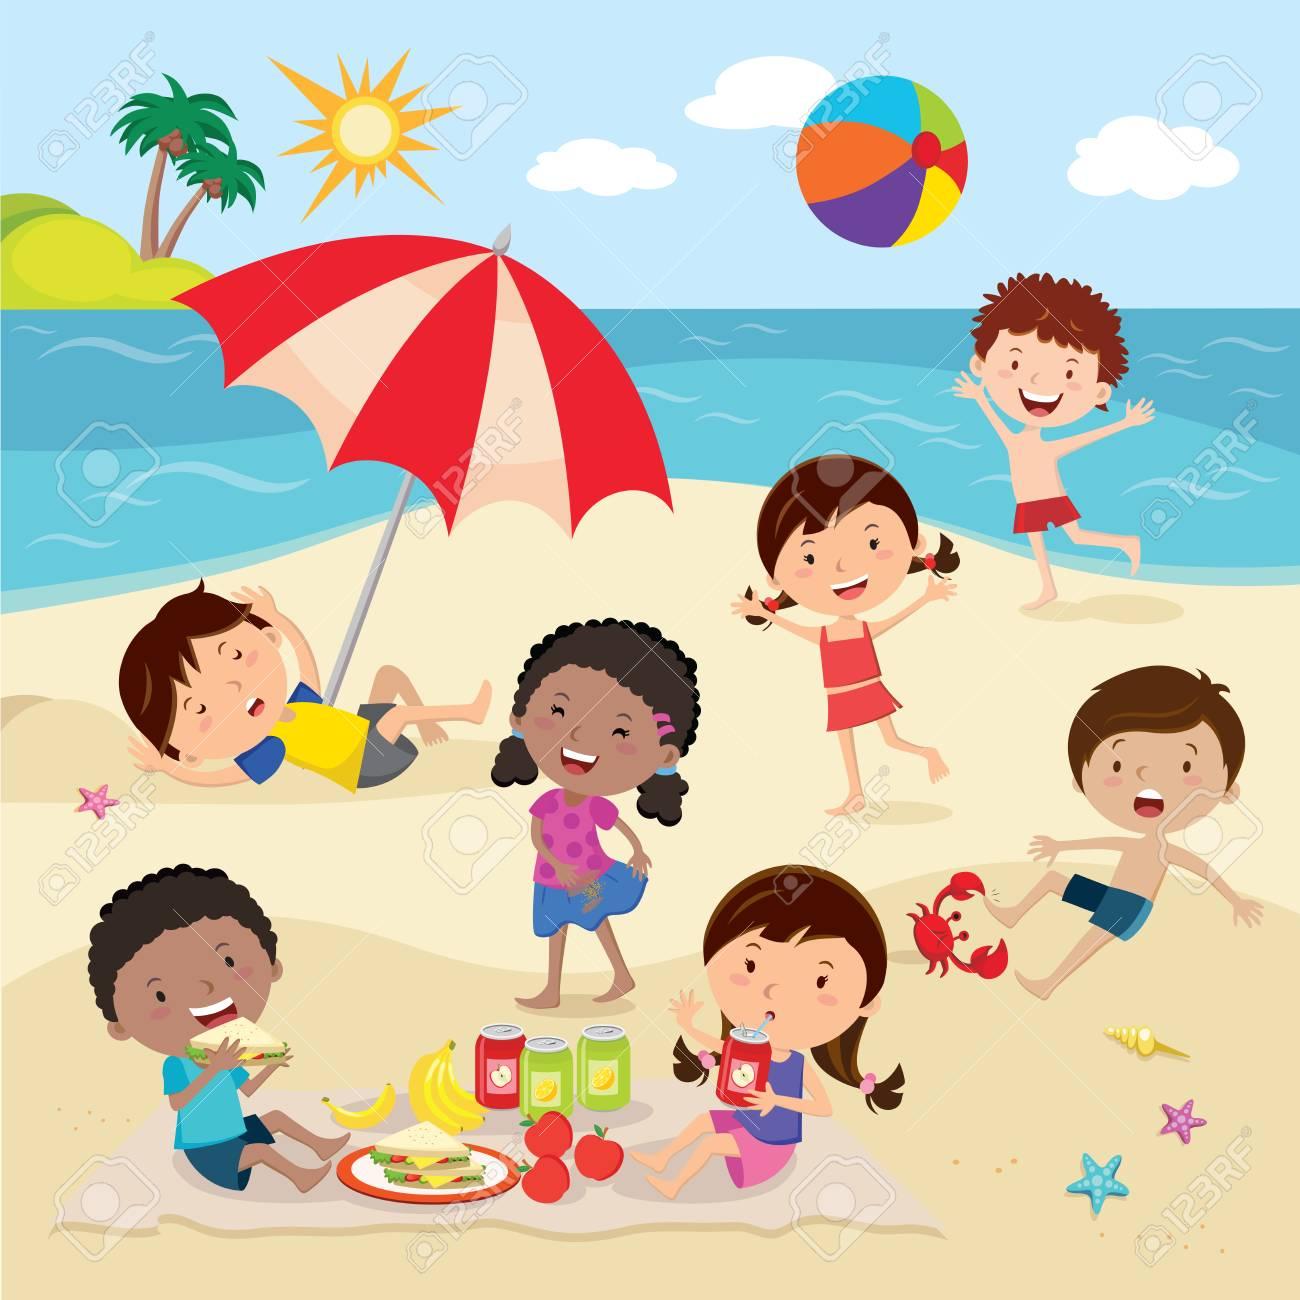 Happy kids having fun on the beach.